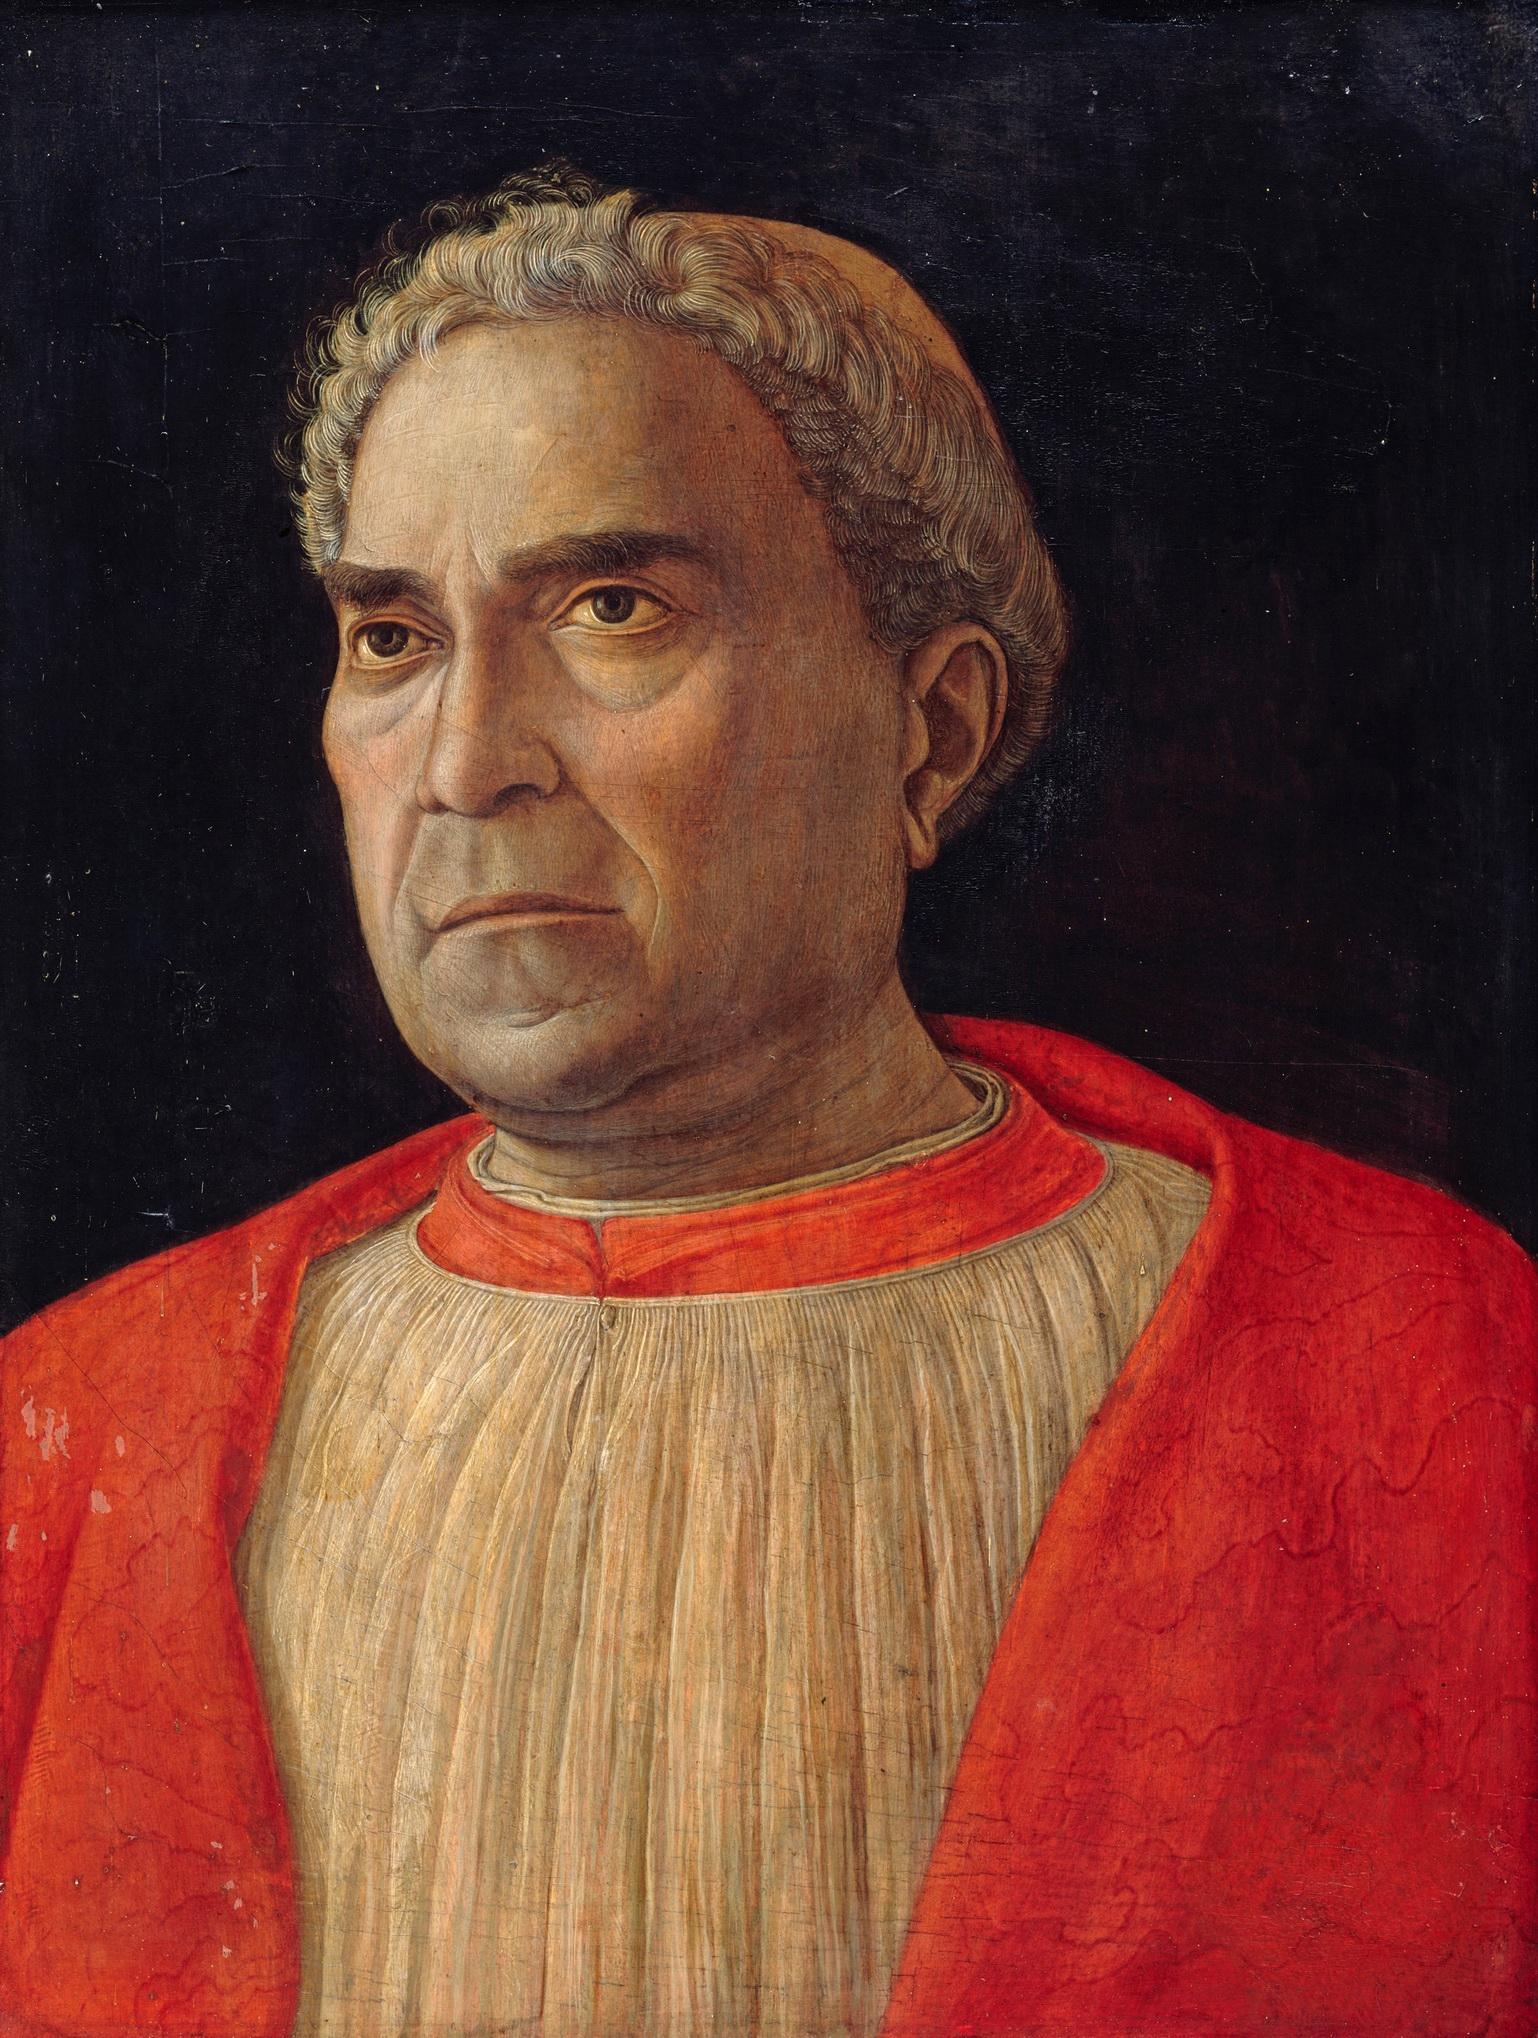 Ludovico trevisano portrait by andrea mantegna.jpg